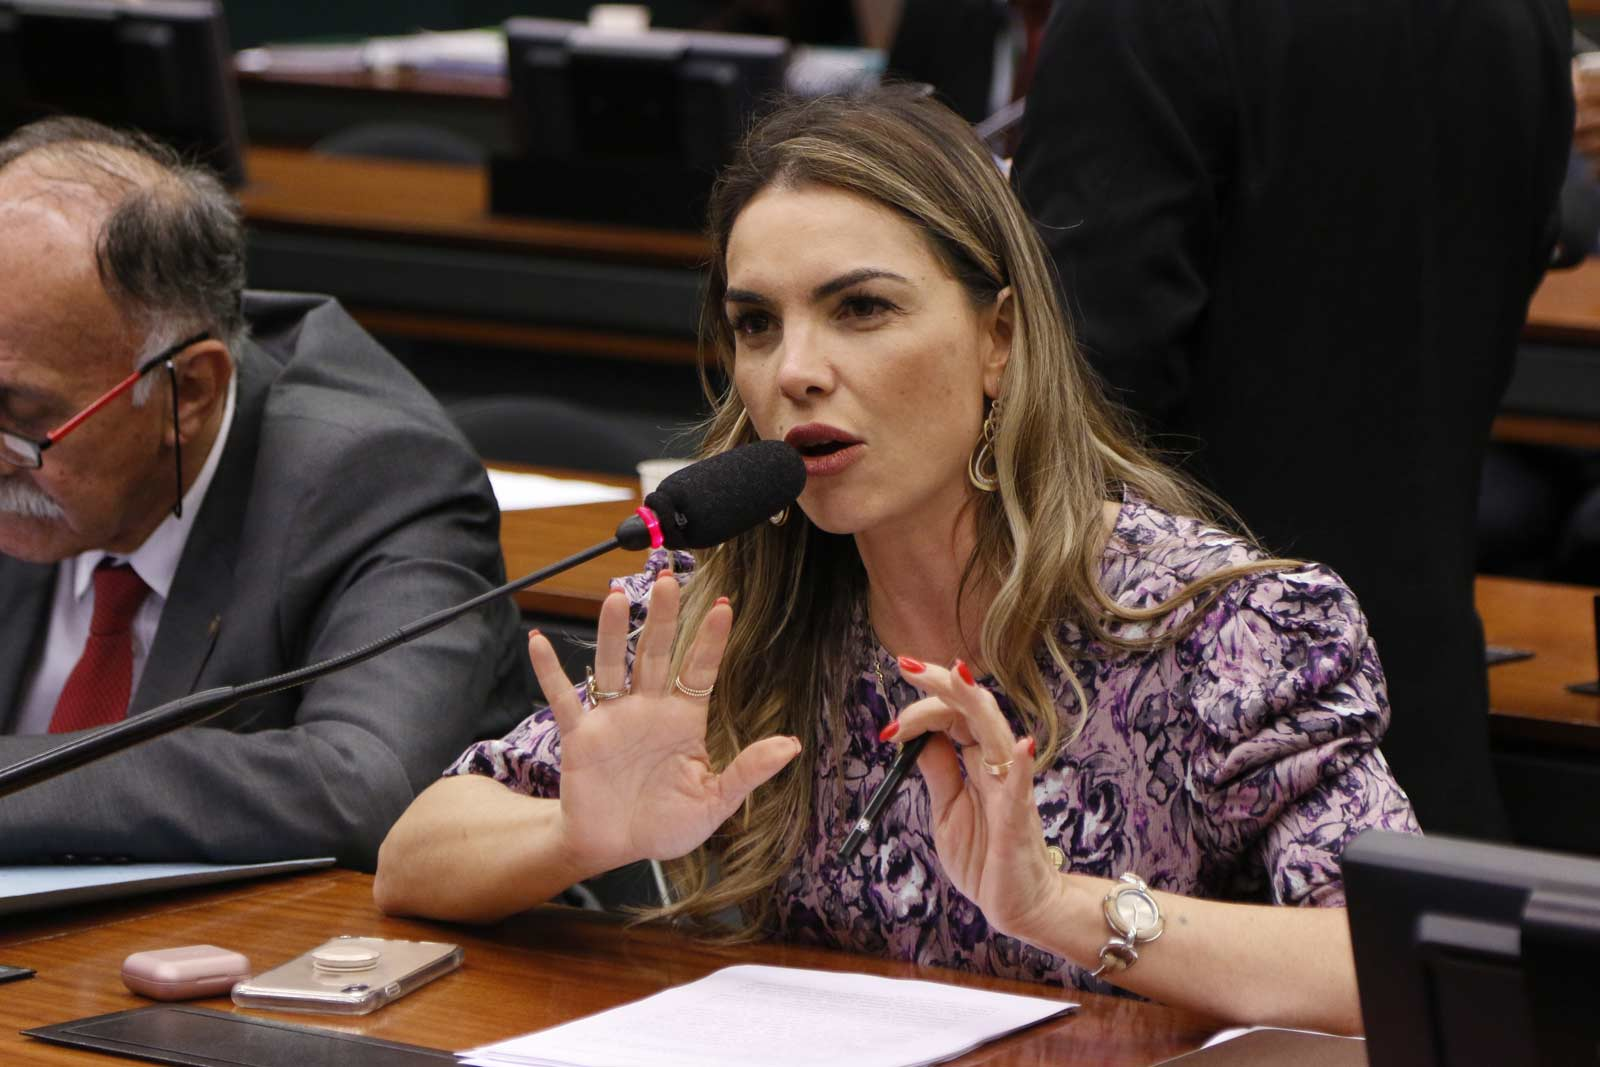 AO VIVO: Paula Belmonte participa de debate sobre a primeira infância